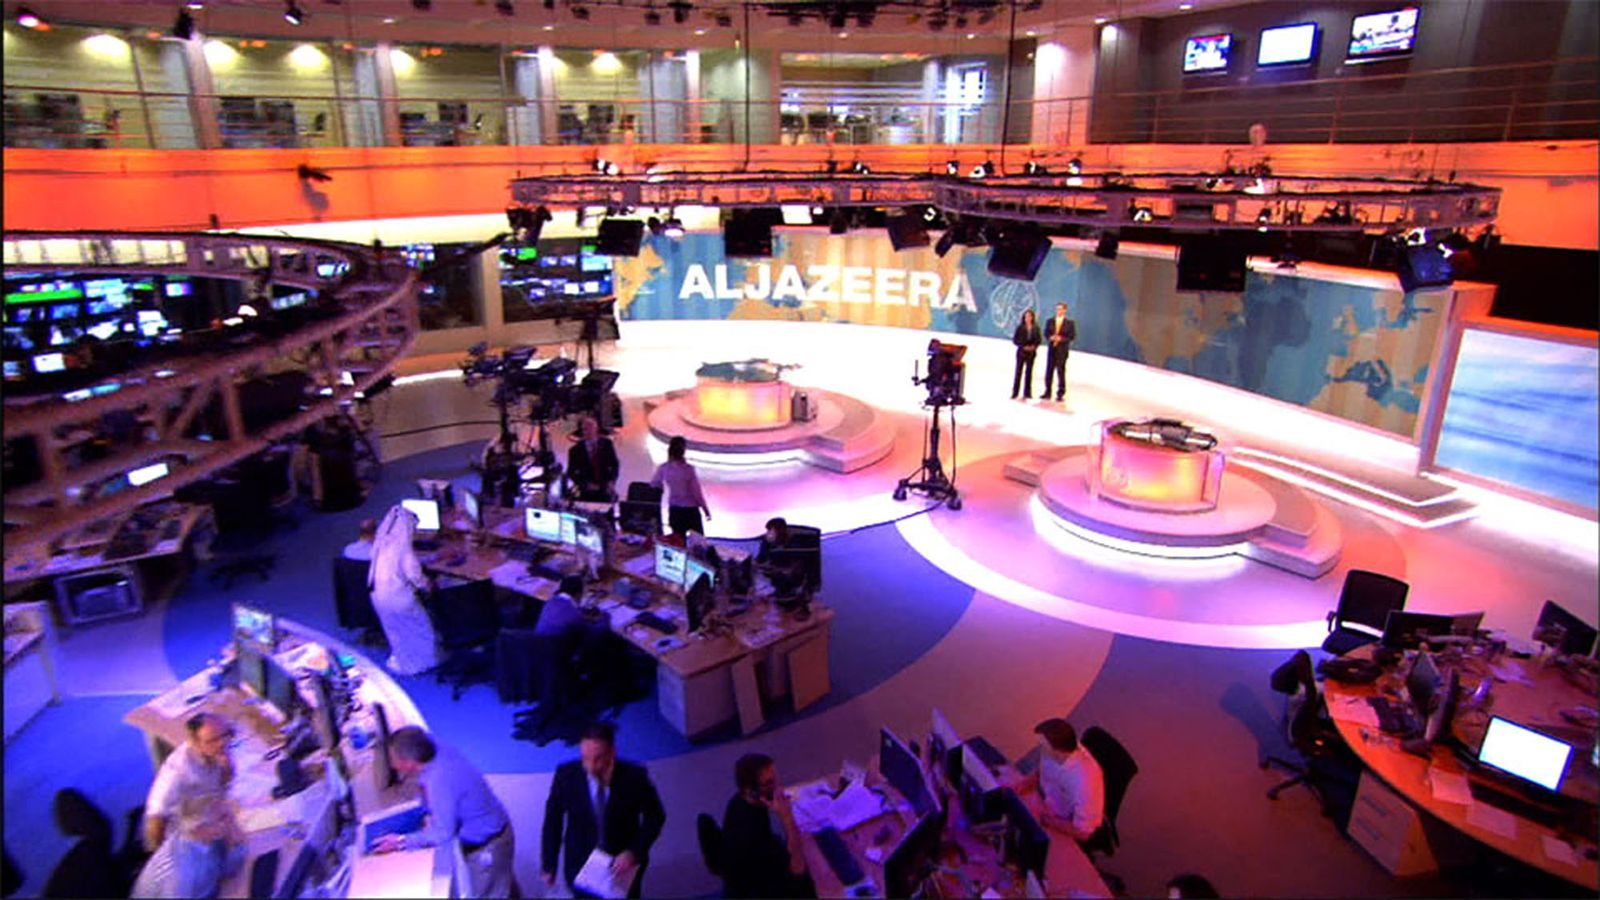 QATAR AL-JAZEERA / Doha / Al-Dschasira